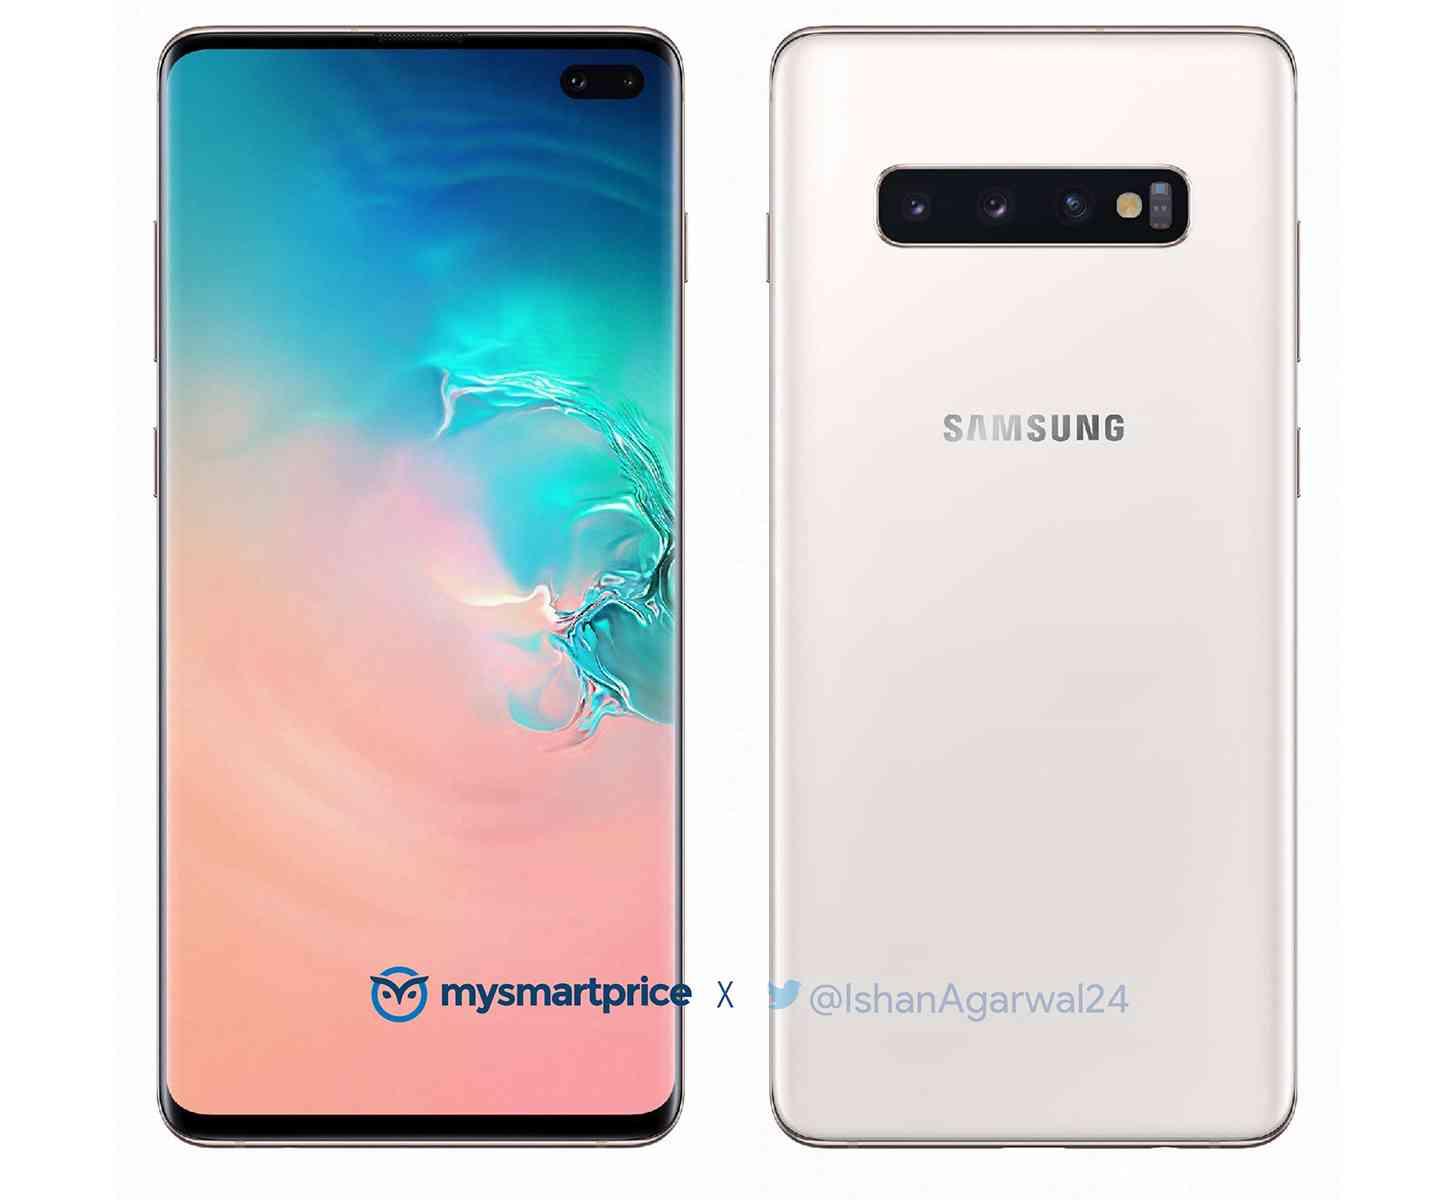 Samsung Galaxy S10+ Luxurious Ceramic White